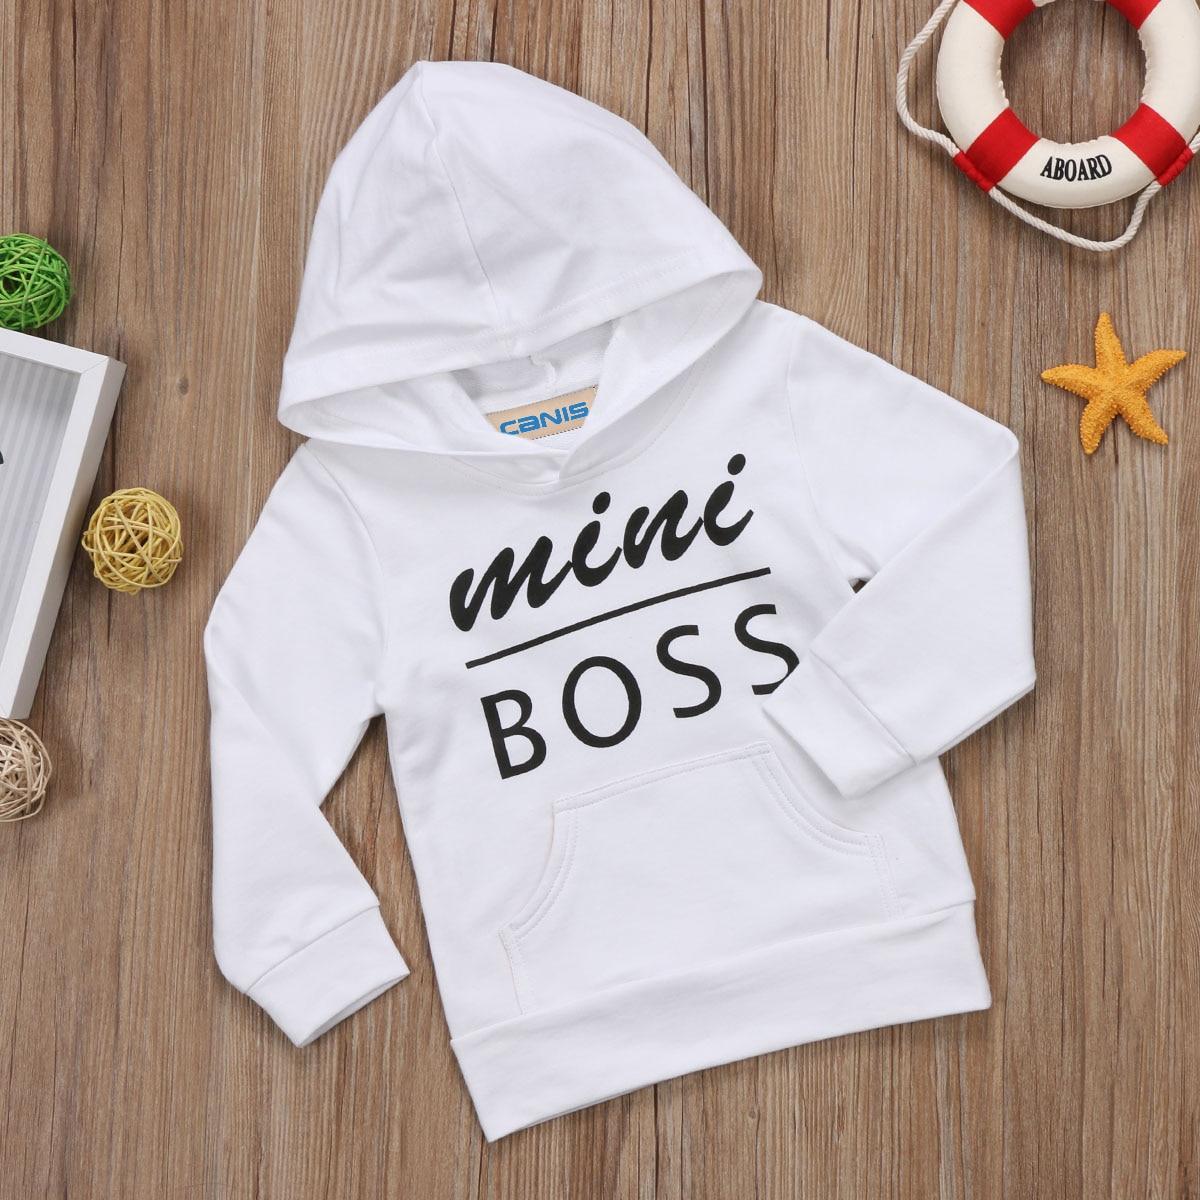 Newborn Kids Autumn Long Sleeve Sweatshirts Toddler Baby Boys Girls Mini Boss Printed Black White Hoodies Sweatshirt Tops 0-5T